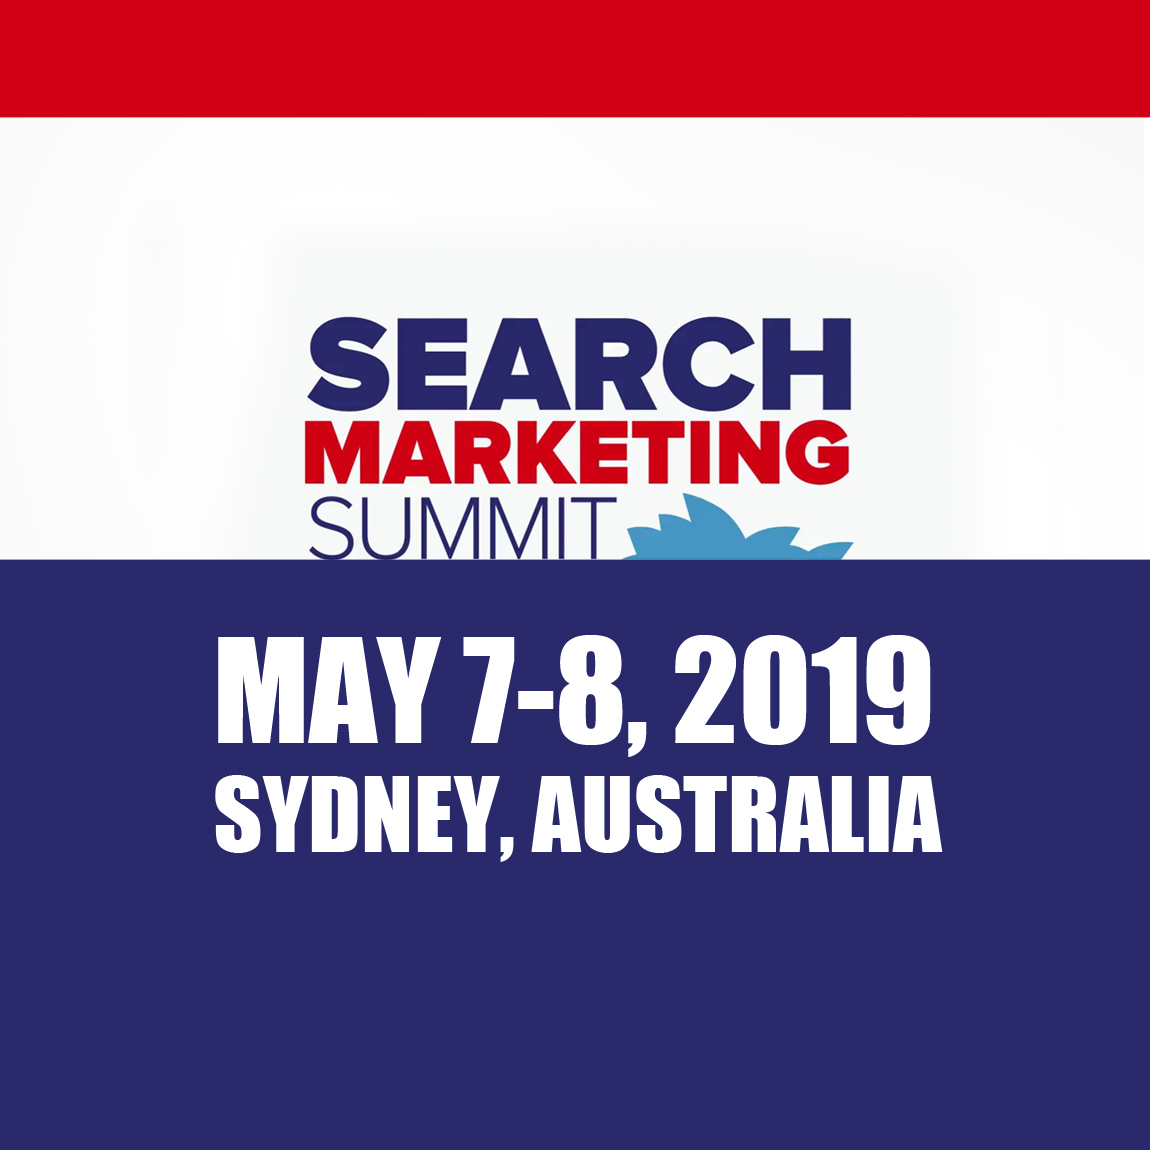 Search Marketing Summit Australia